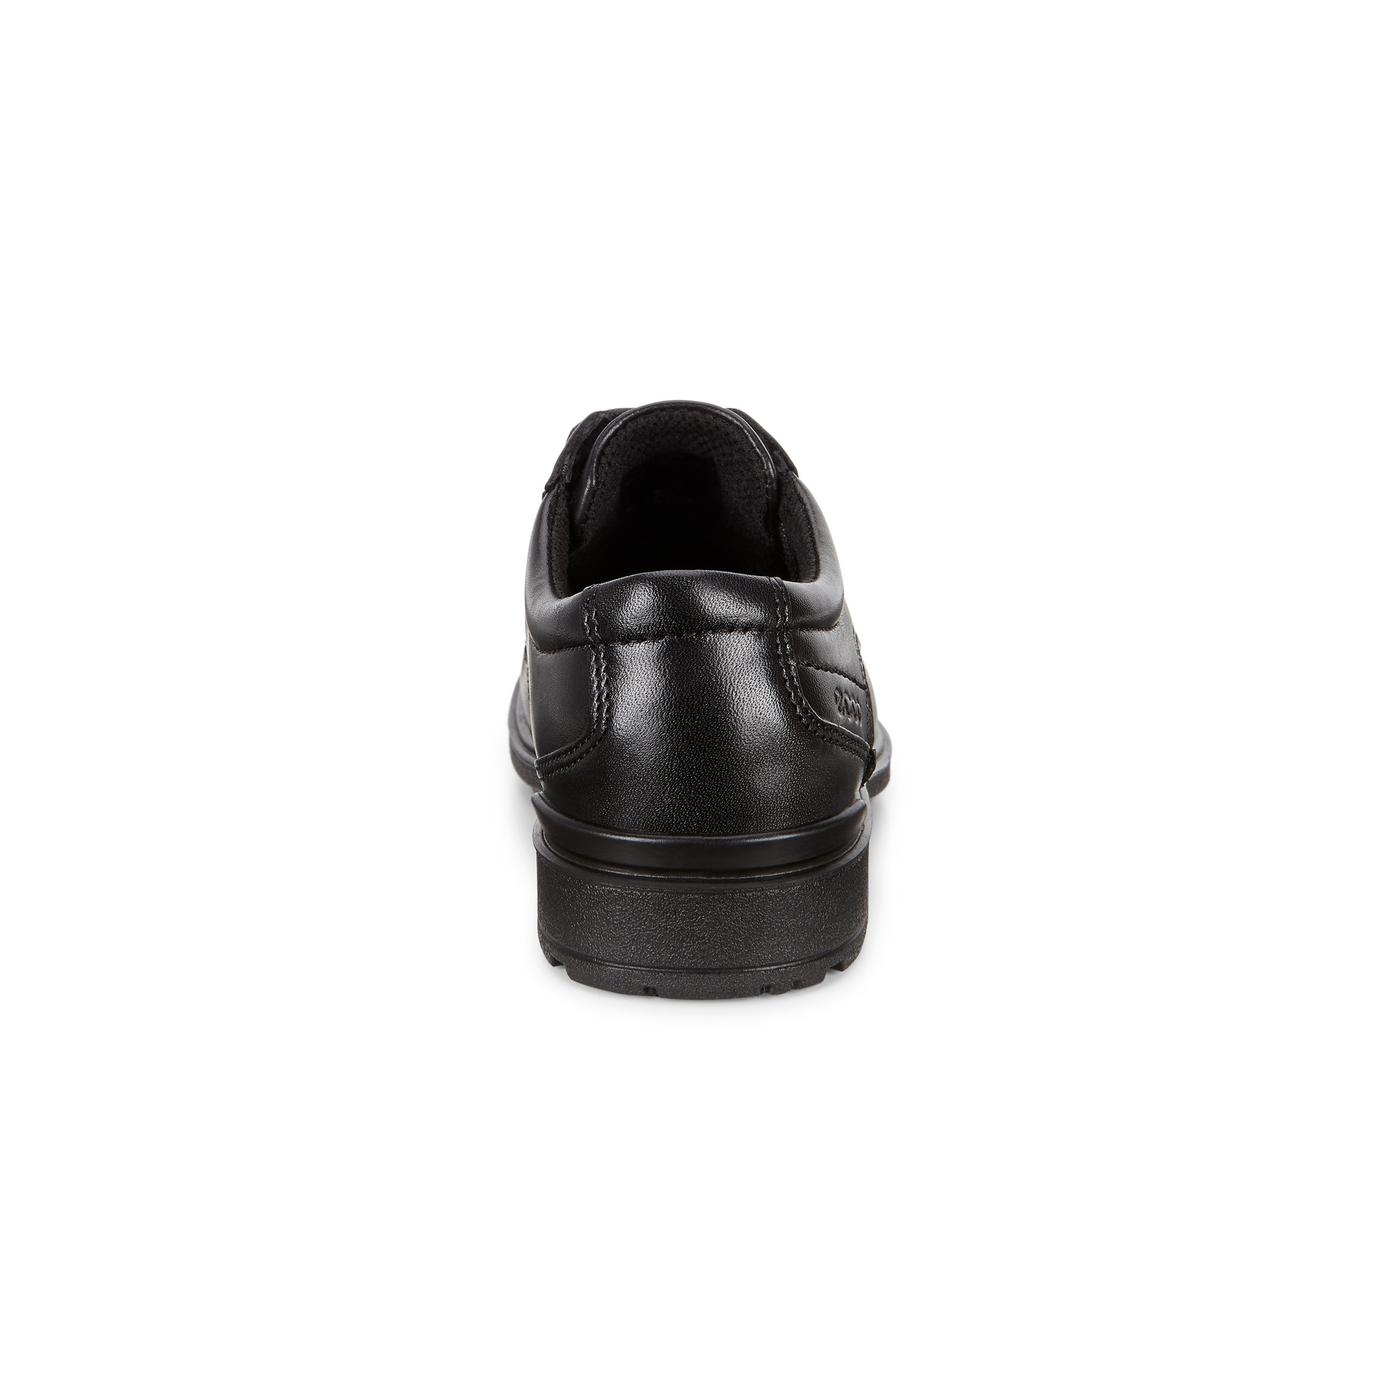 ECCO COHEN Boy's Dress Shoe